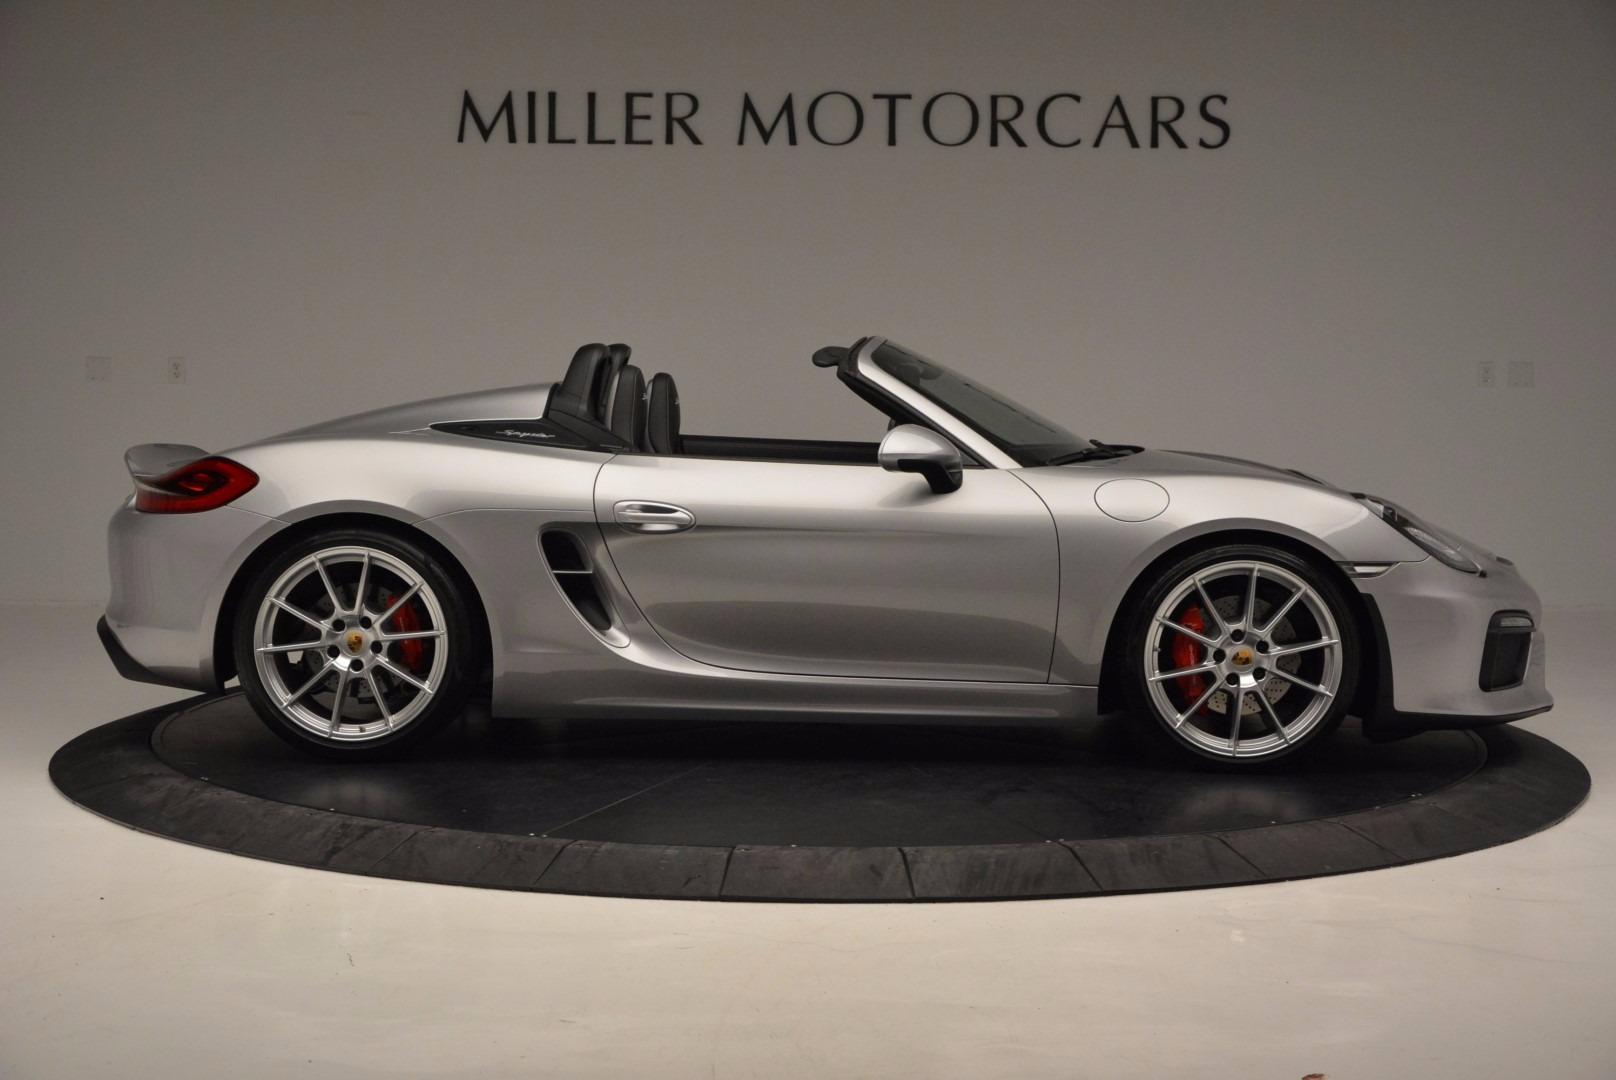 Used 2016 Porsche Boxster Spyder For Sale In Greenwich, CT. Alfa Romeo of Greenwich, 4307A 718_p9